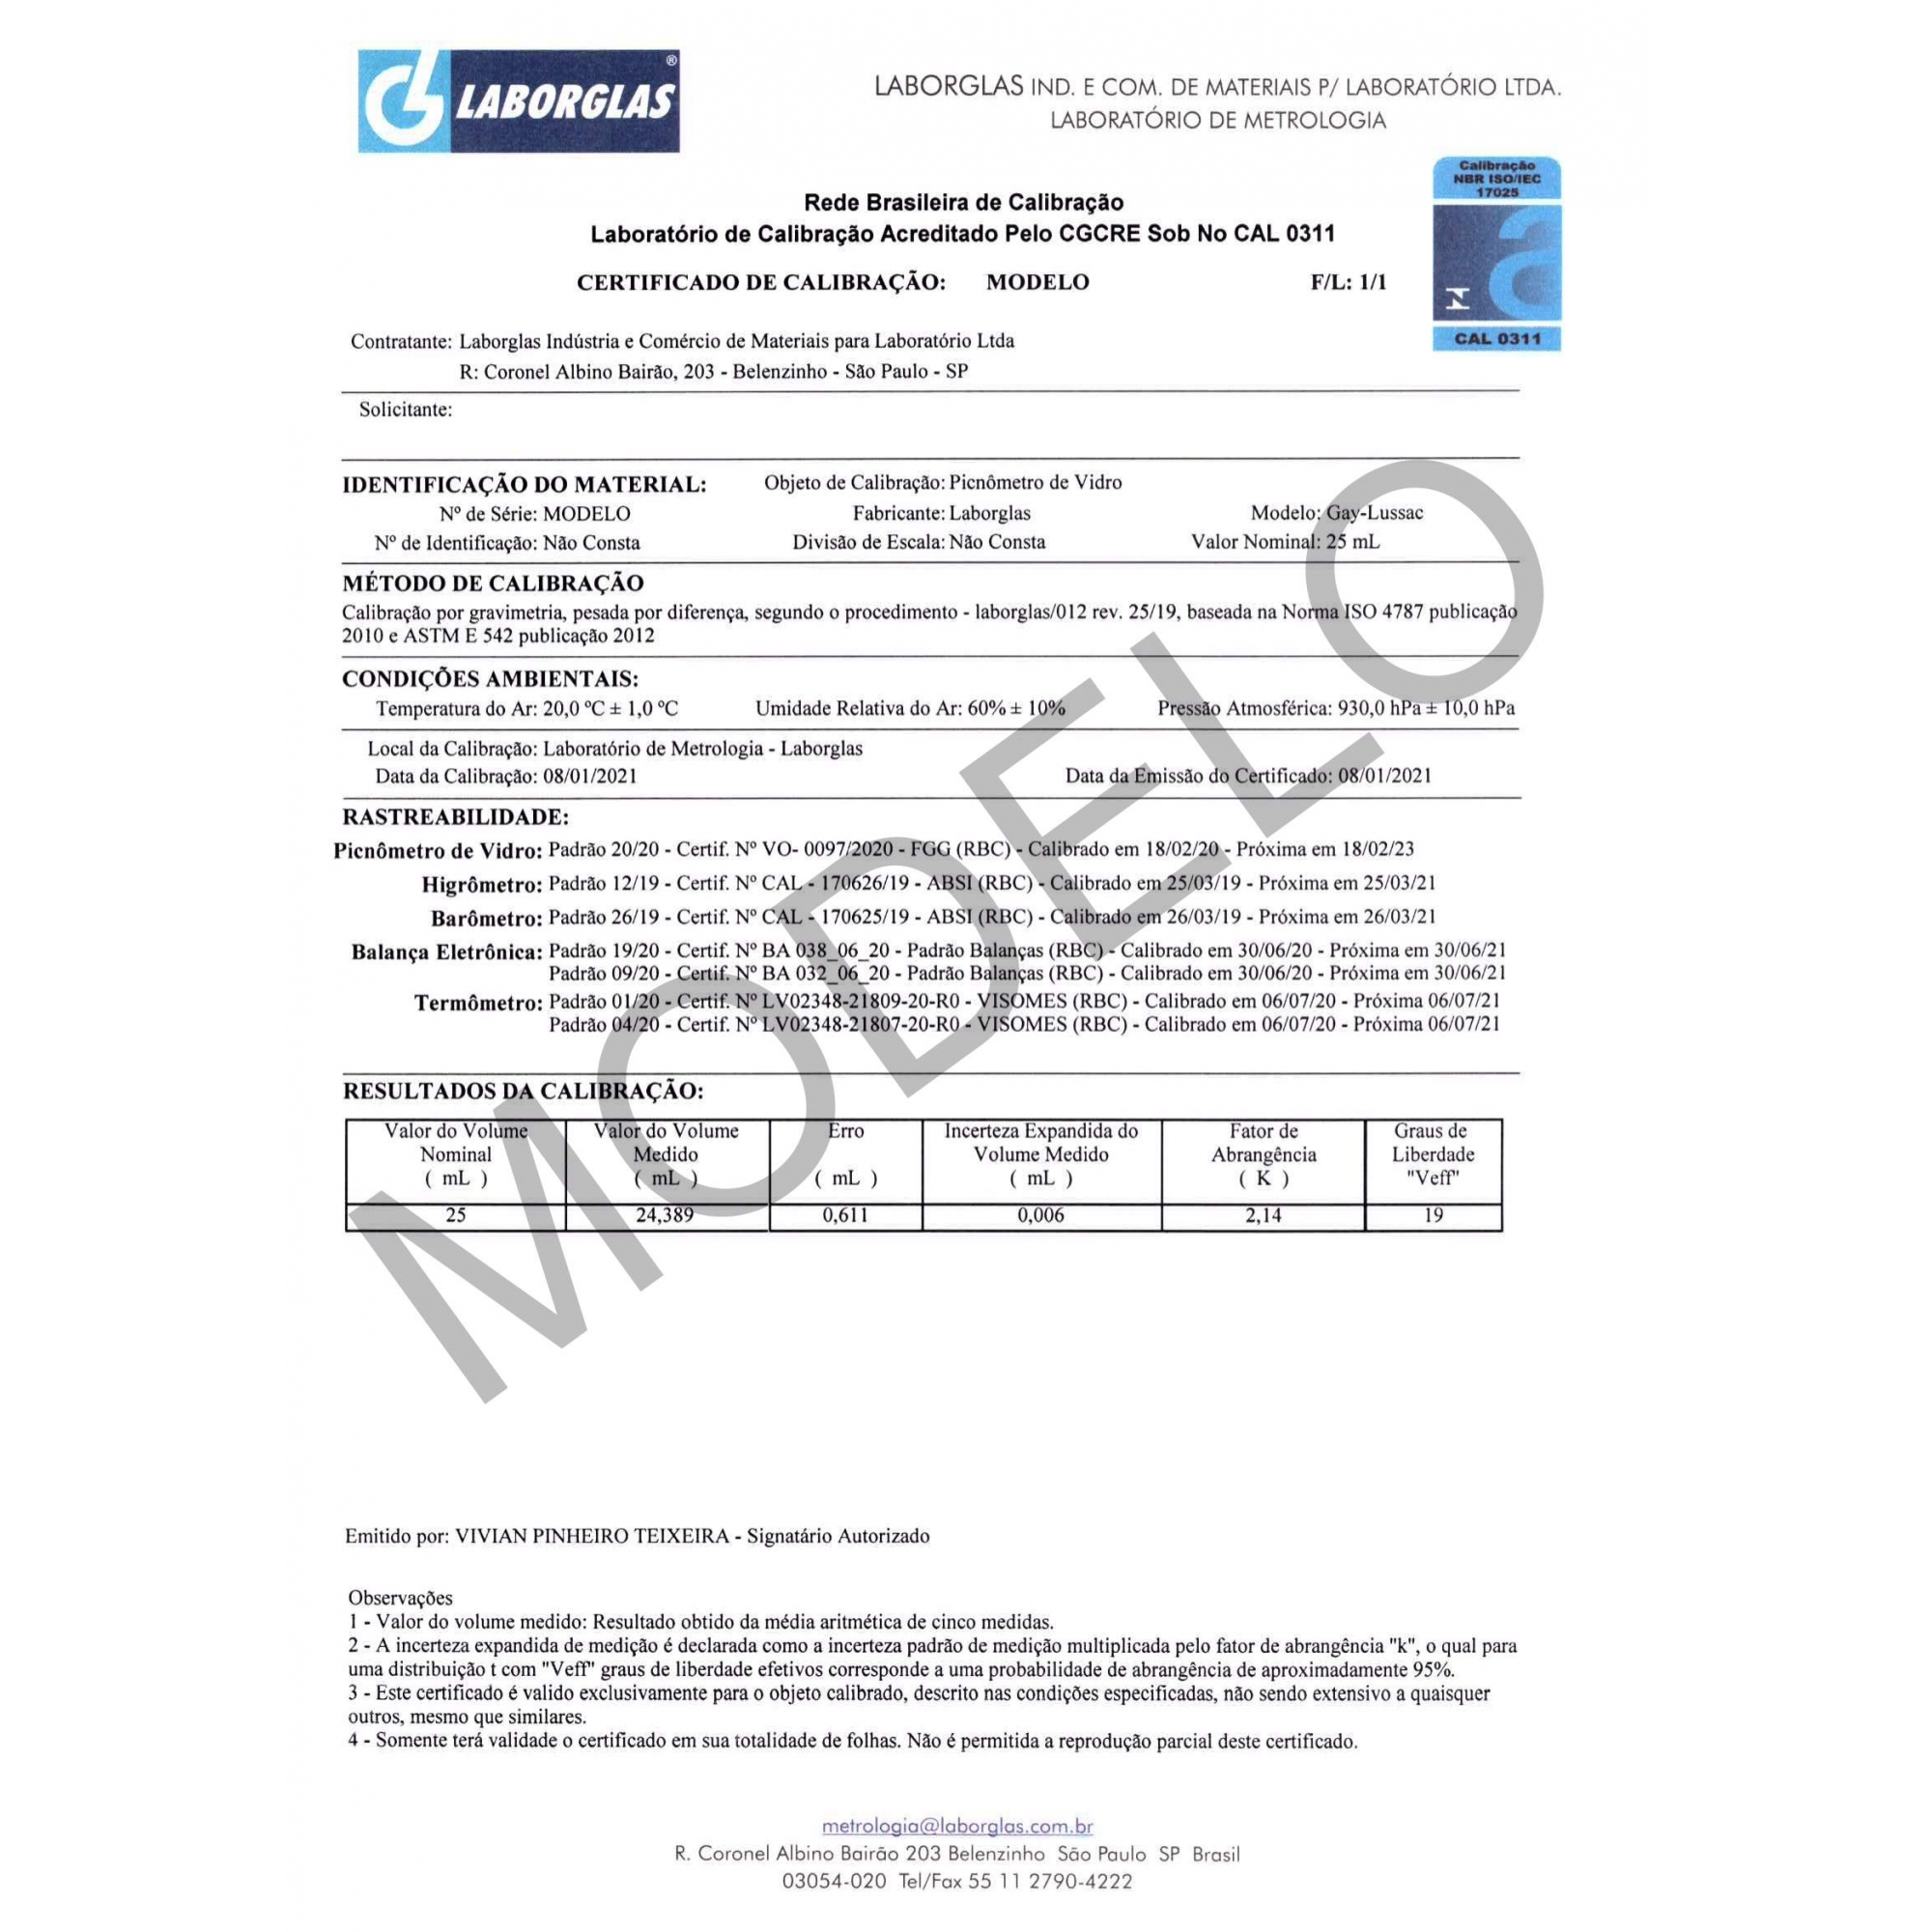 PICNÔMETRO GAY-LUSSAC SEM TERMÔMETRO 1000 ML CERTIFICADO RBC - Laborglas - Cód. 9491154-R